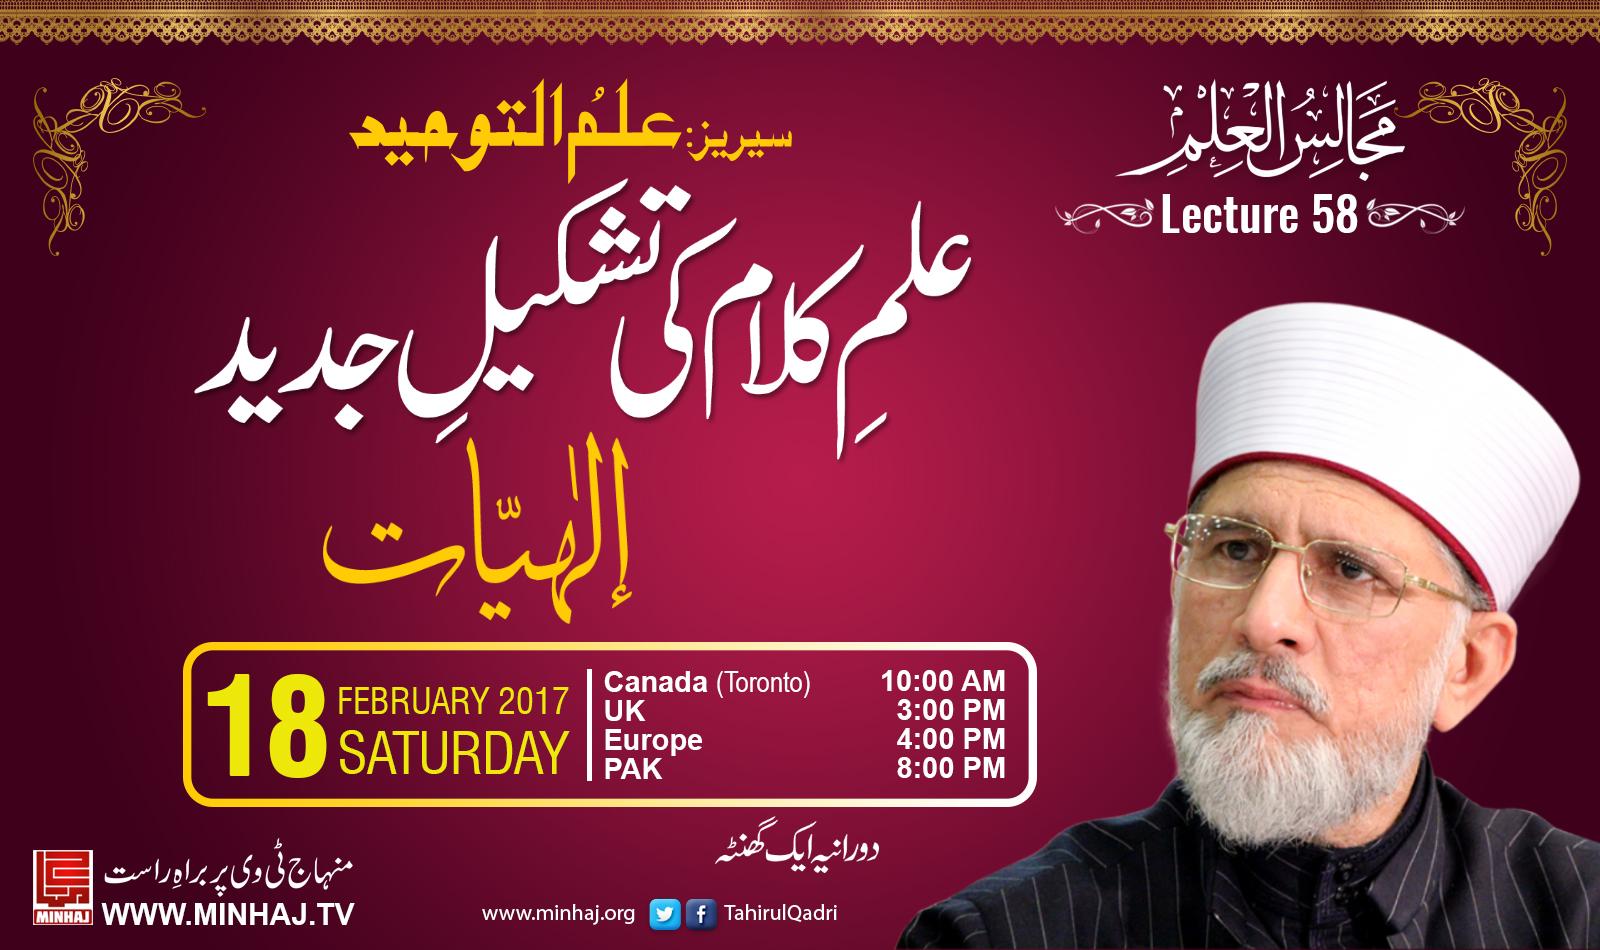 Majalis-ul-ilm (Lecture 58) - by Shaykh-ul-Islam Dr Muhammad Tahir-ul-Qadri